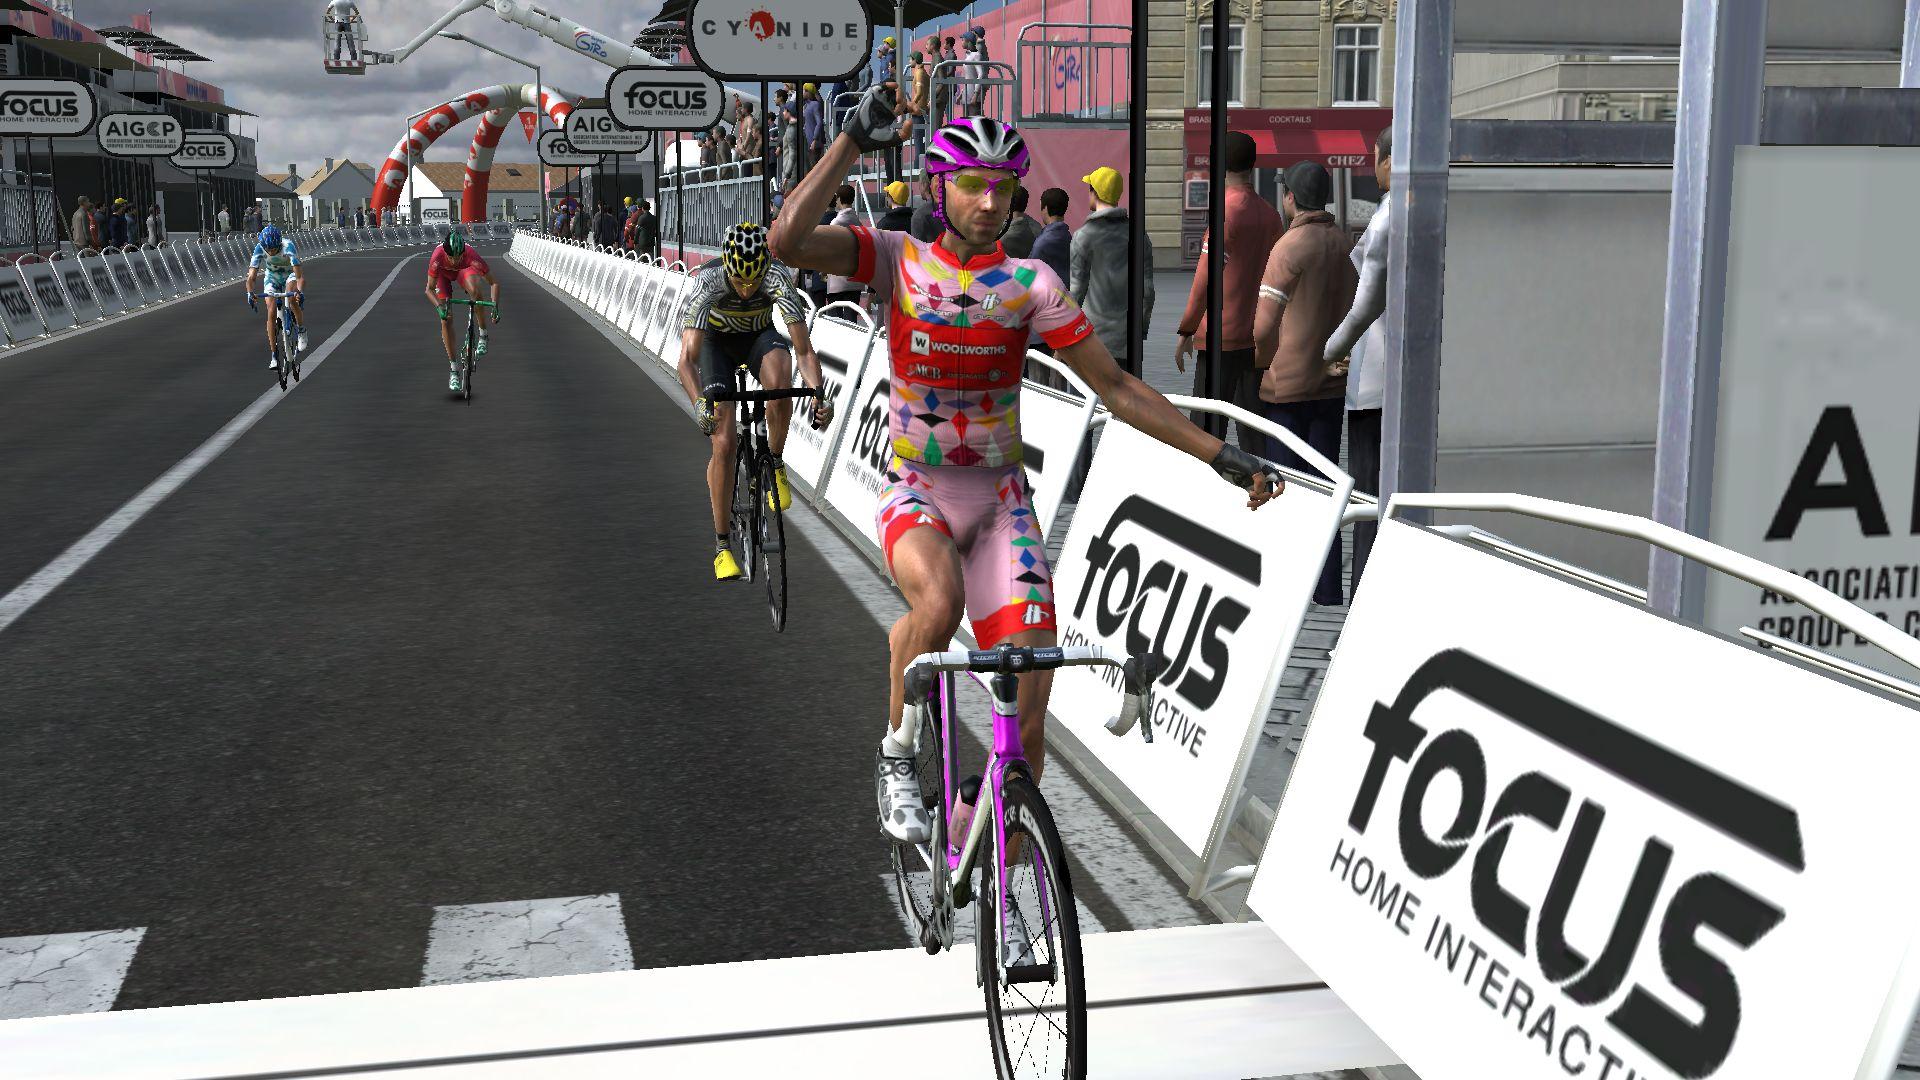 pcmdaily.com/images/mg/2019/Races/GTM/Giro/mg19_giro_18_PCM0262.jpg